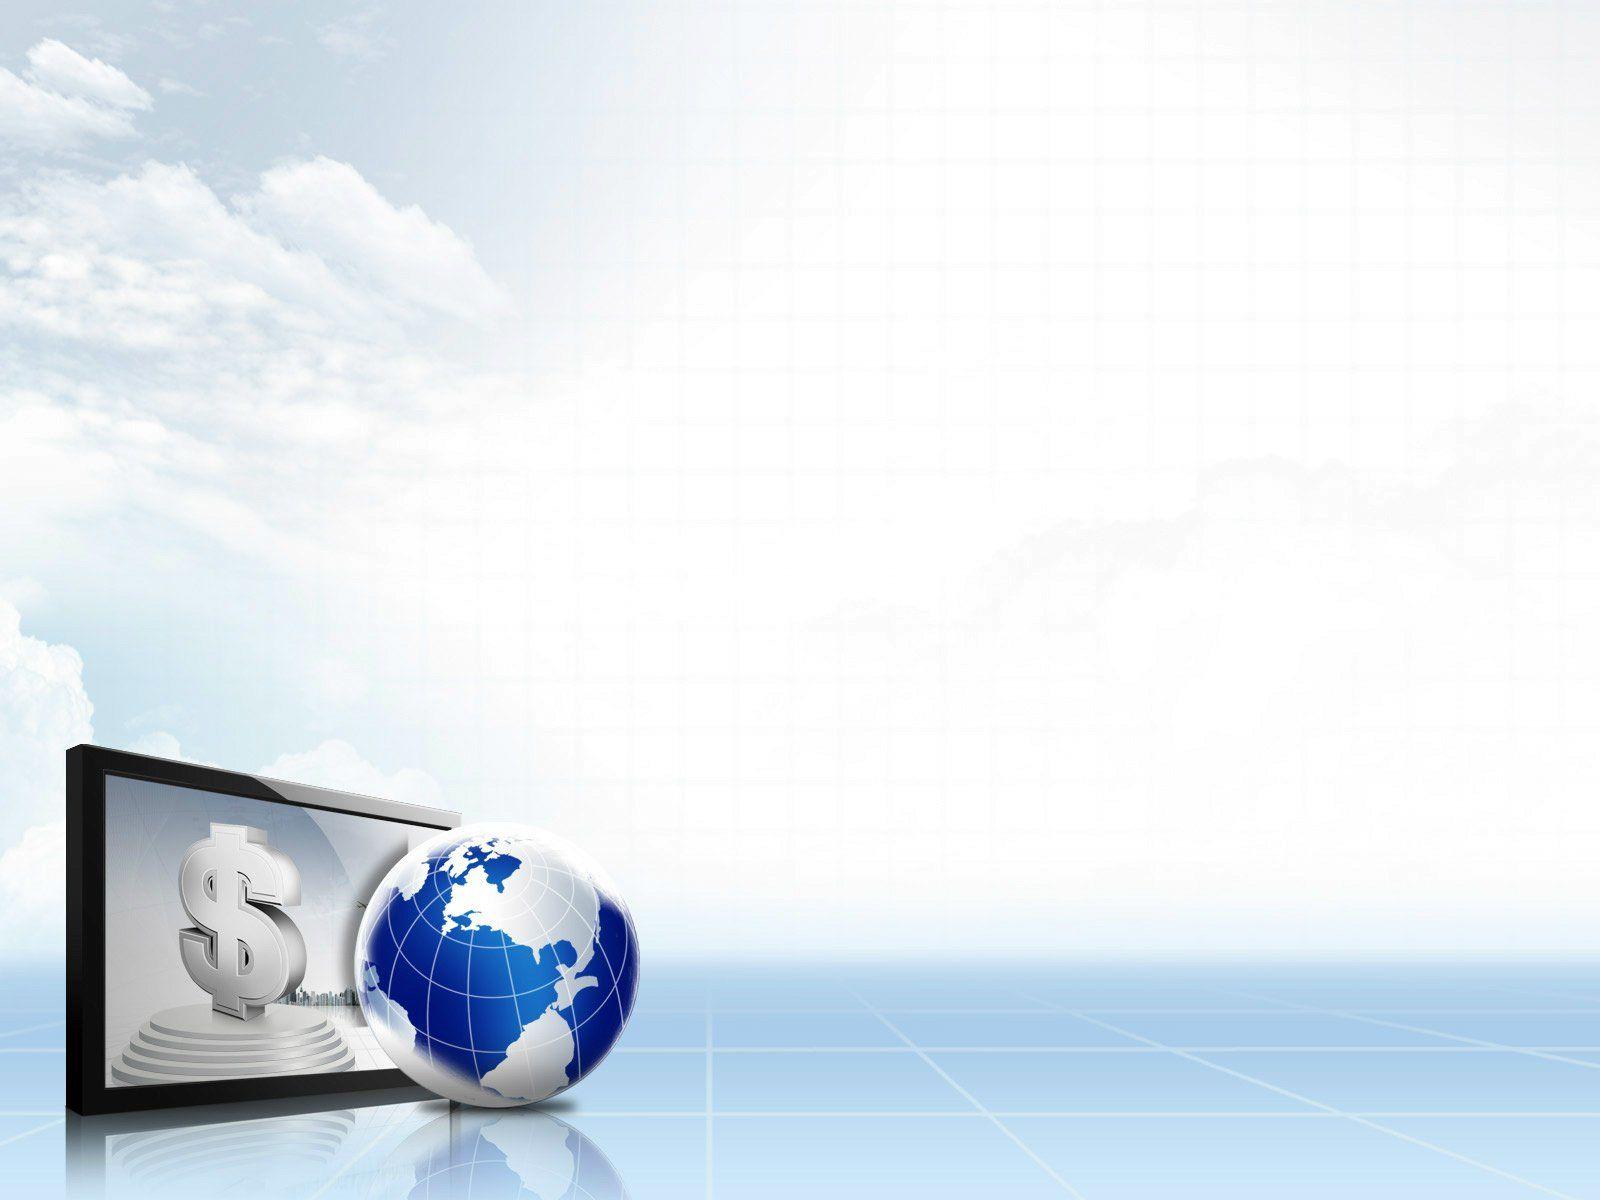 Net Lease Properties & Triple Net Leased Commercial Real Estate